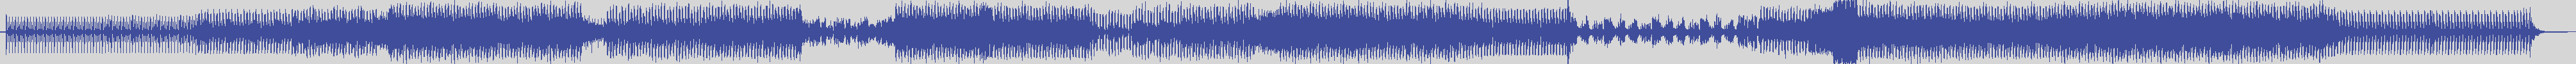 just_digital_records [JS1406] Sugar Freak - Music Change My Life [Lys Vocal Mix] audio wave form